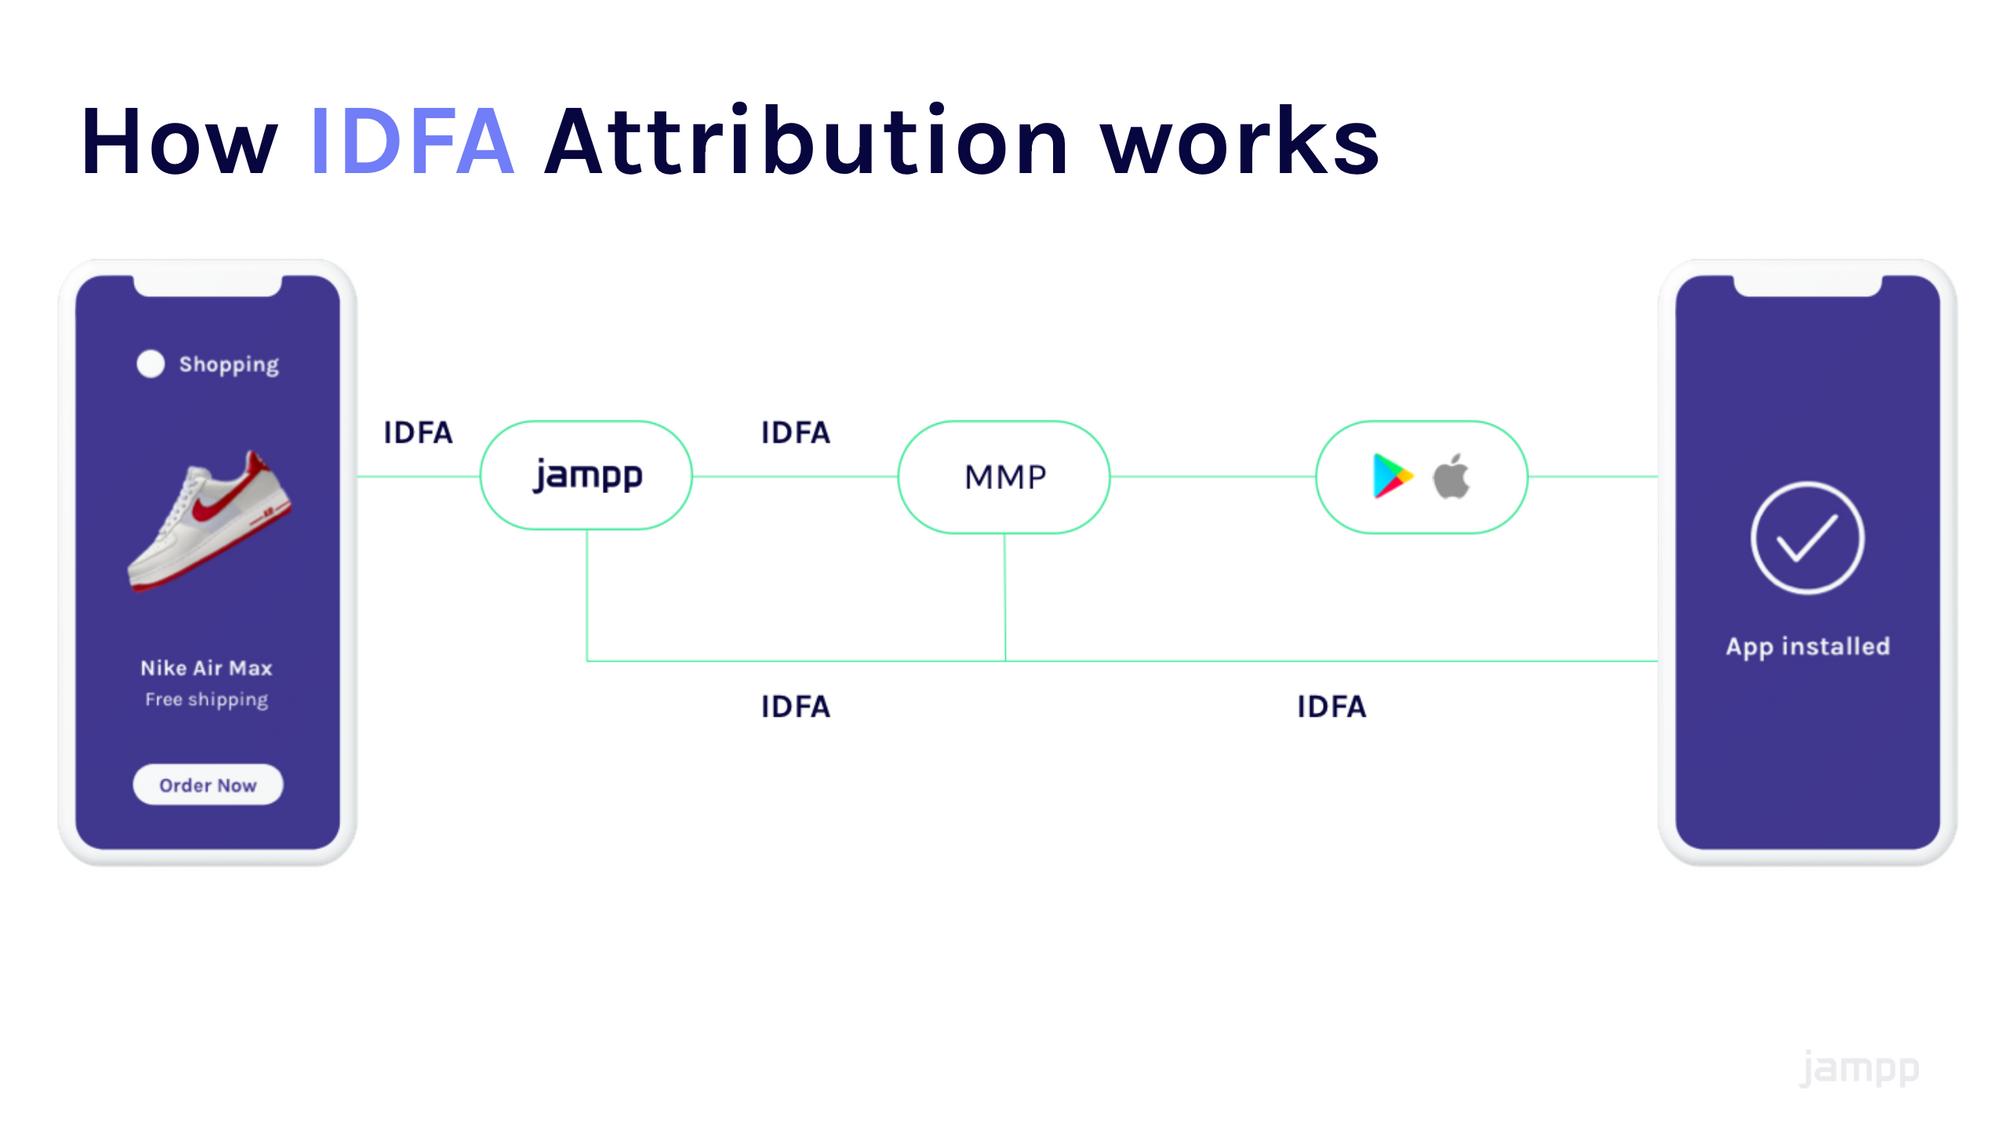 How IDFA Attribution works